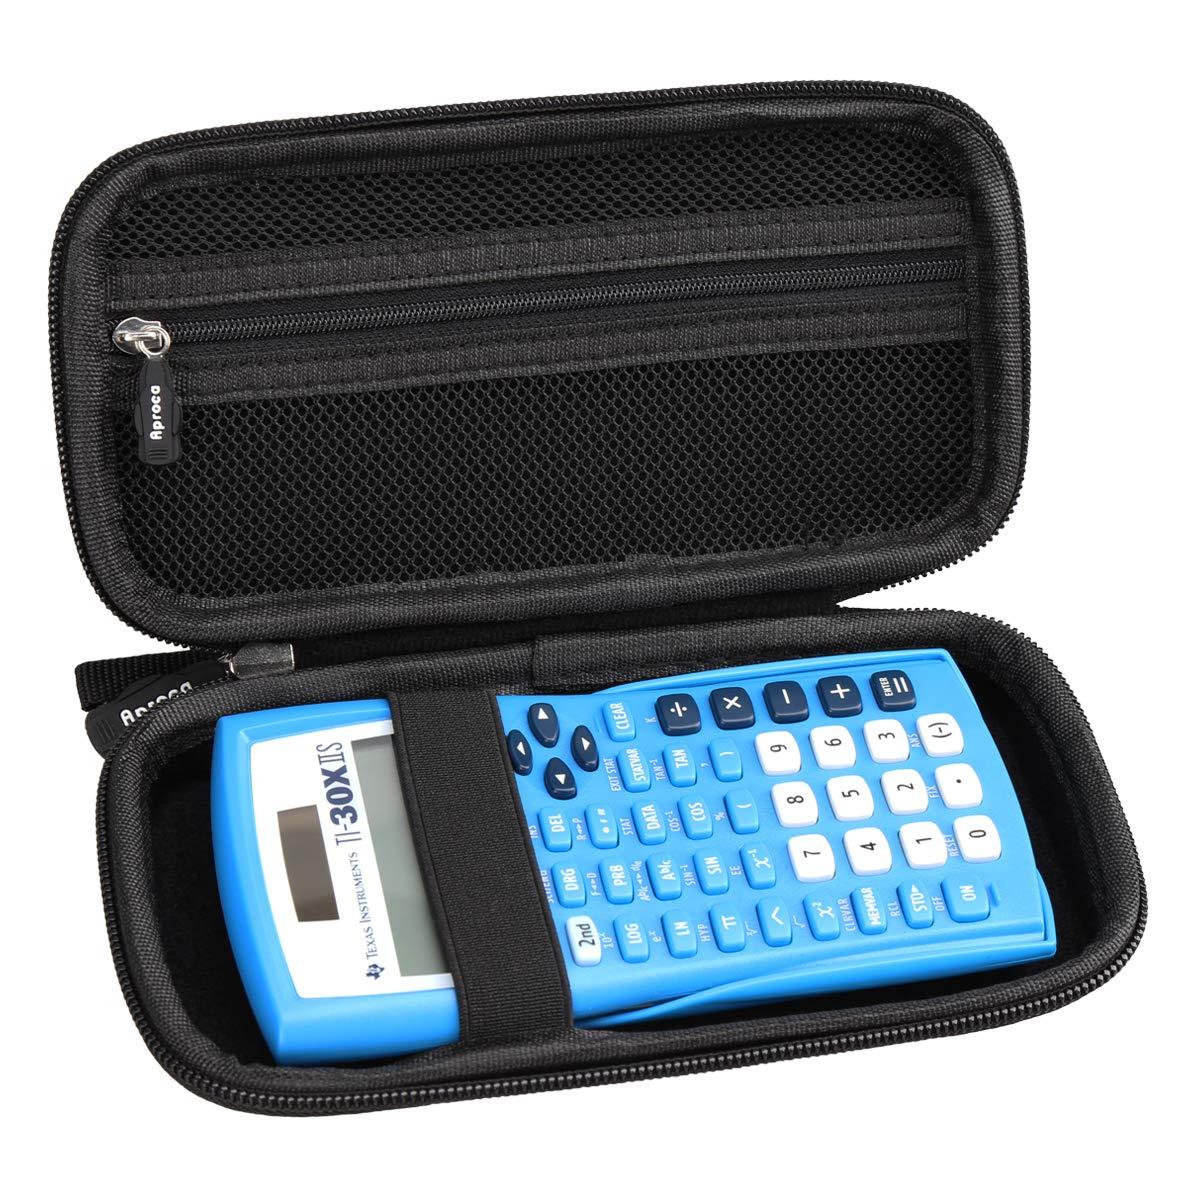 Aproca Hard Travel Case Bag for Texas Instruments TI-30X IIS 2-Line Scientific Calculator by Aproca